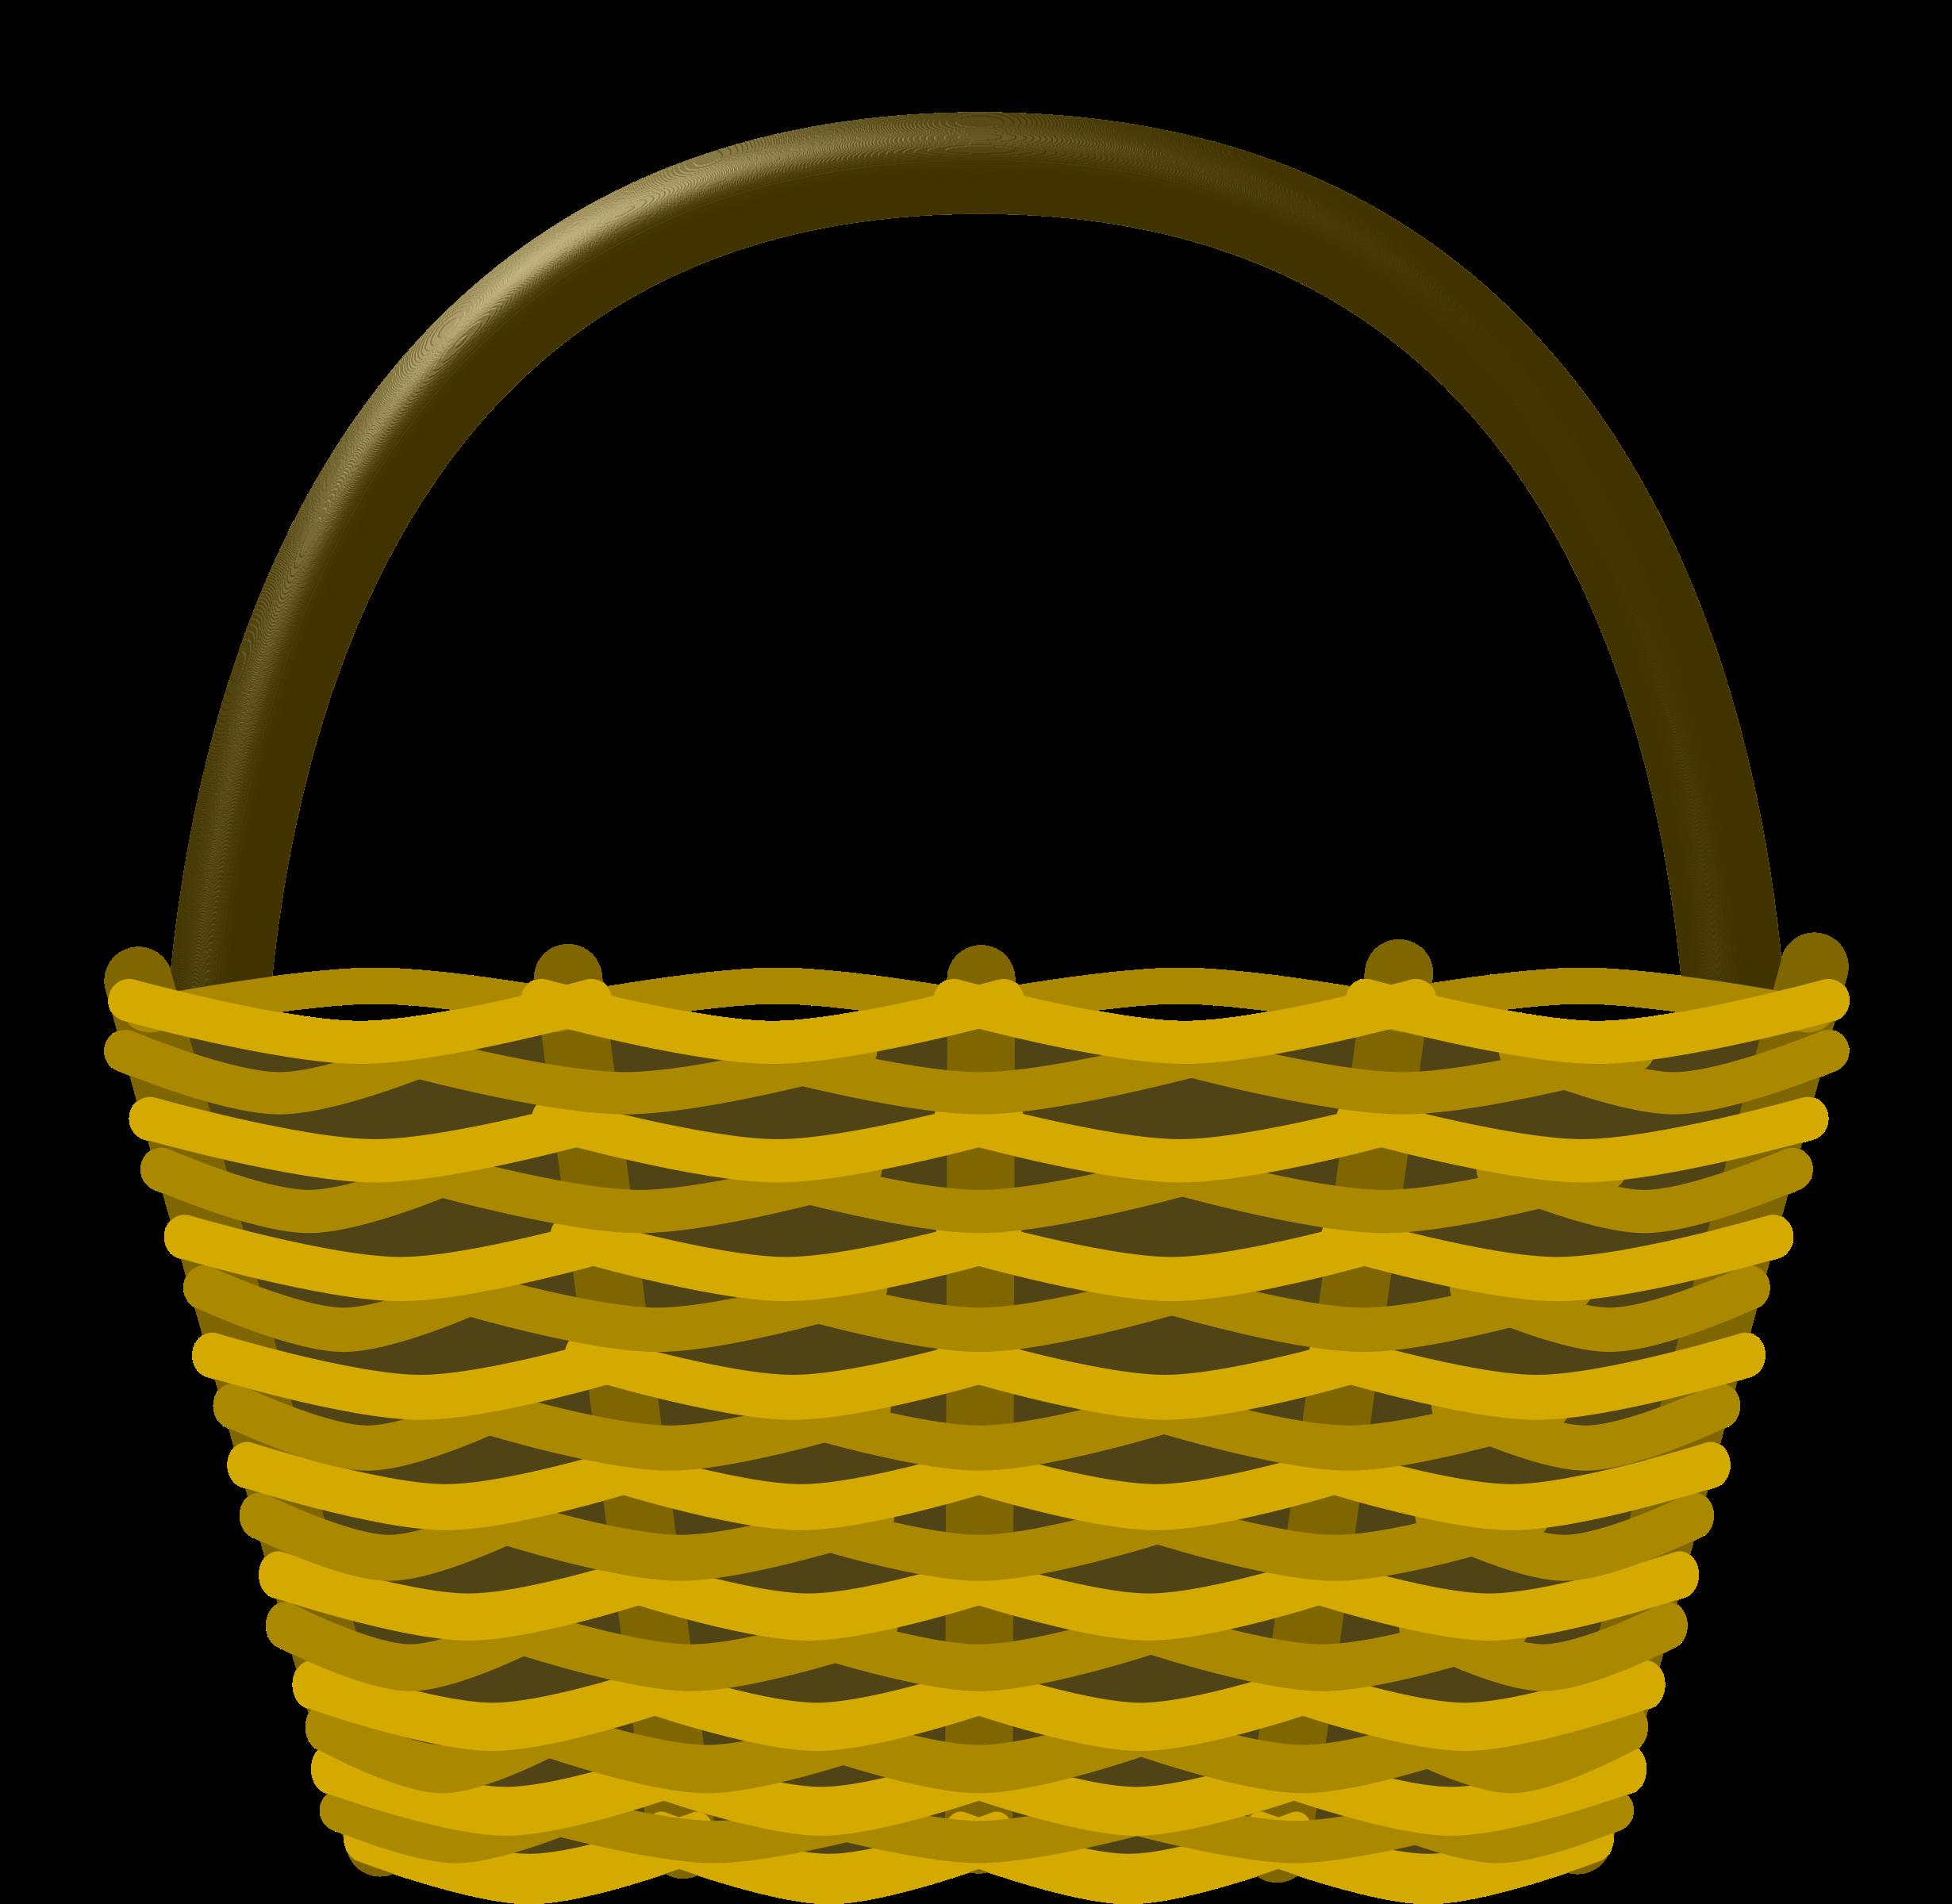 Basket Clipart Tumundografico 2 Wikiclipart